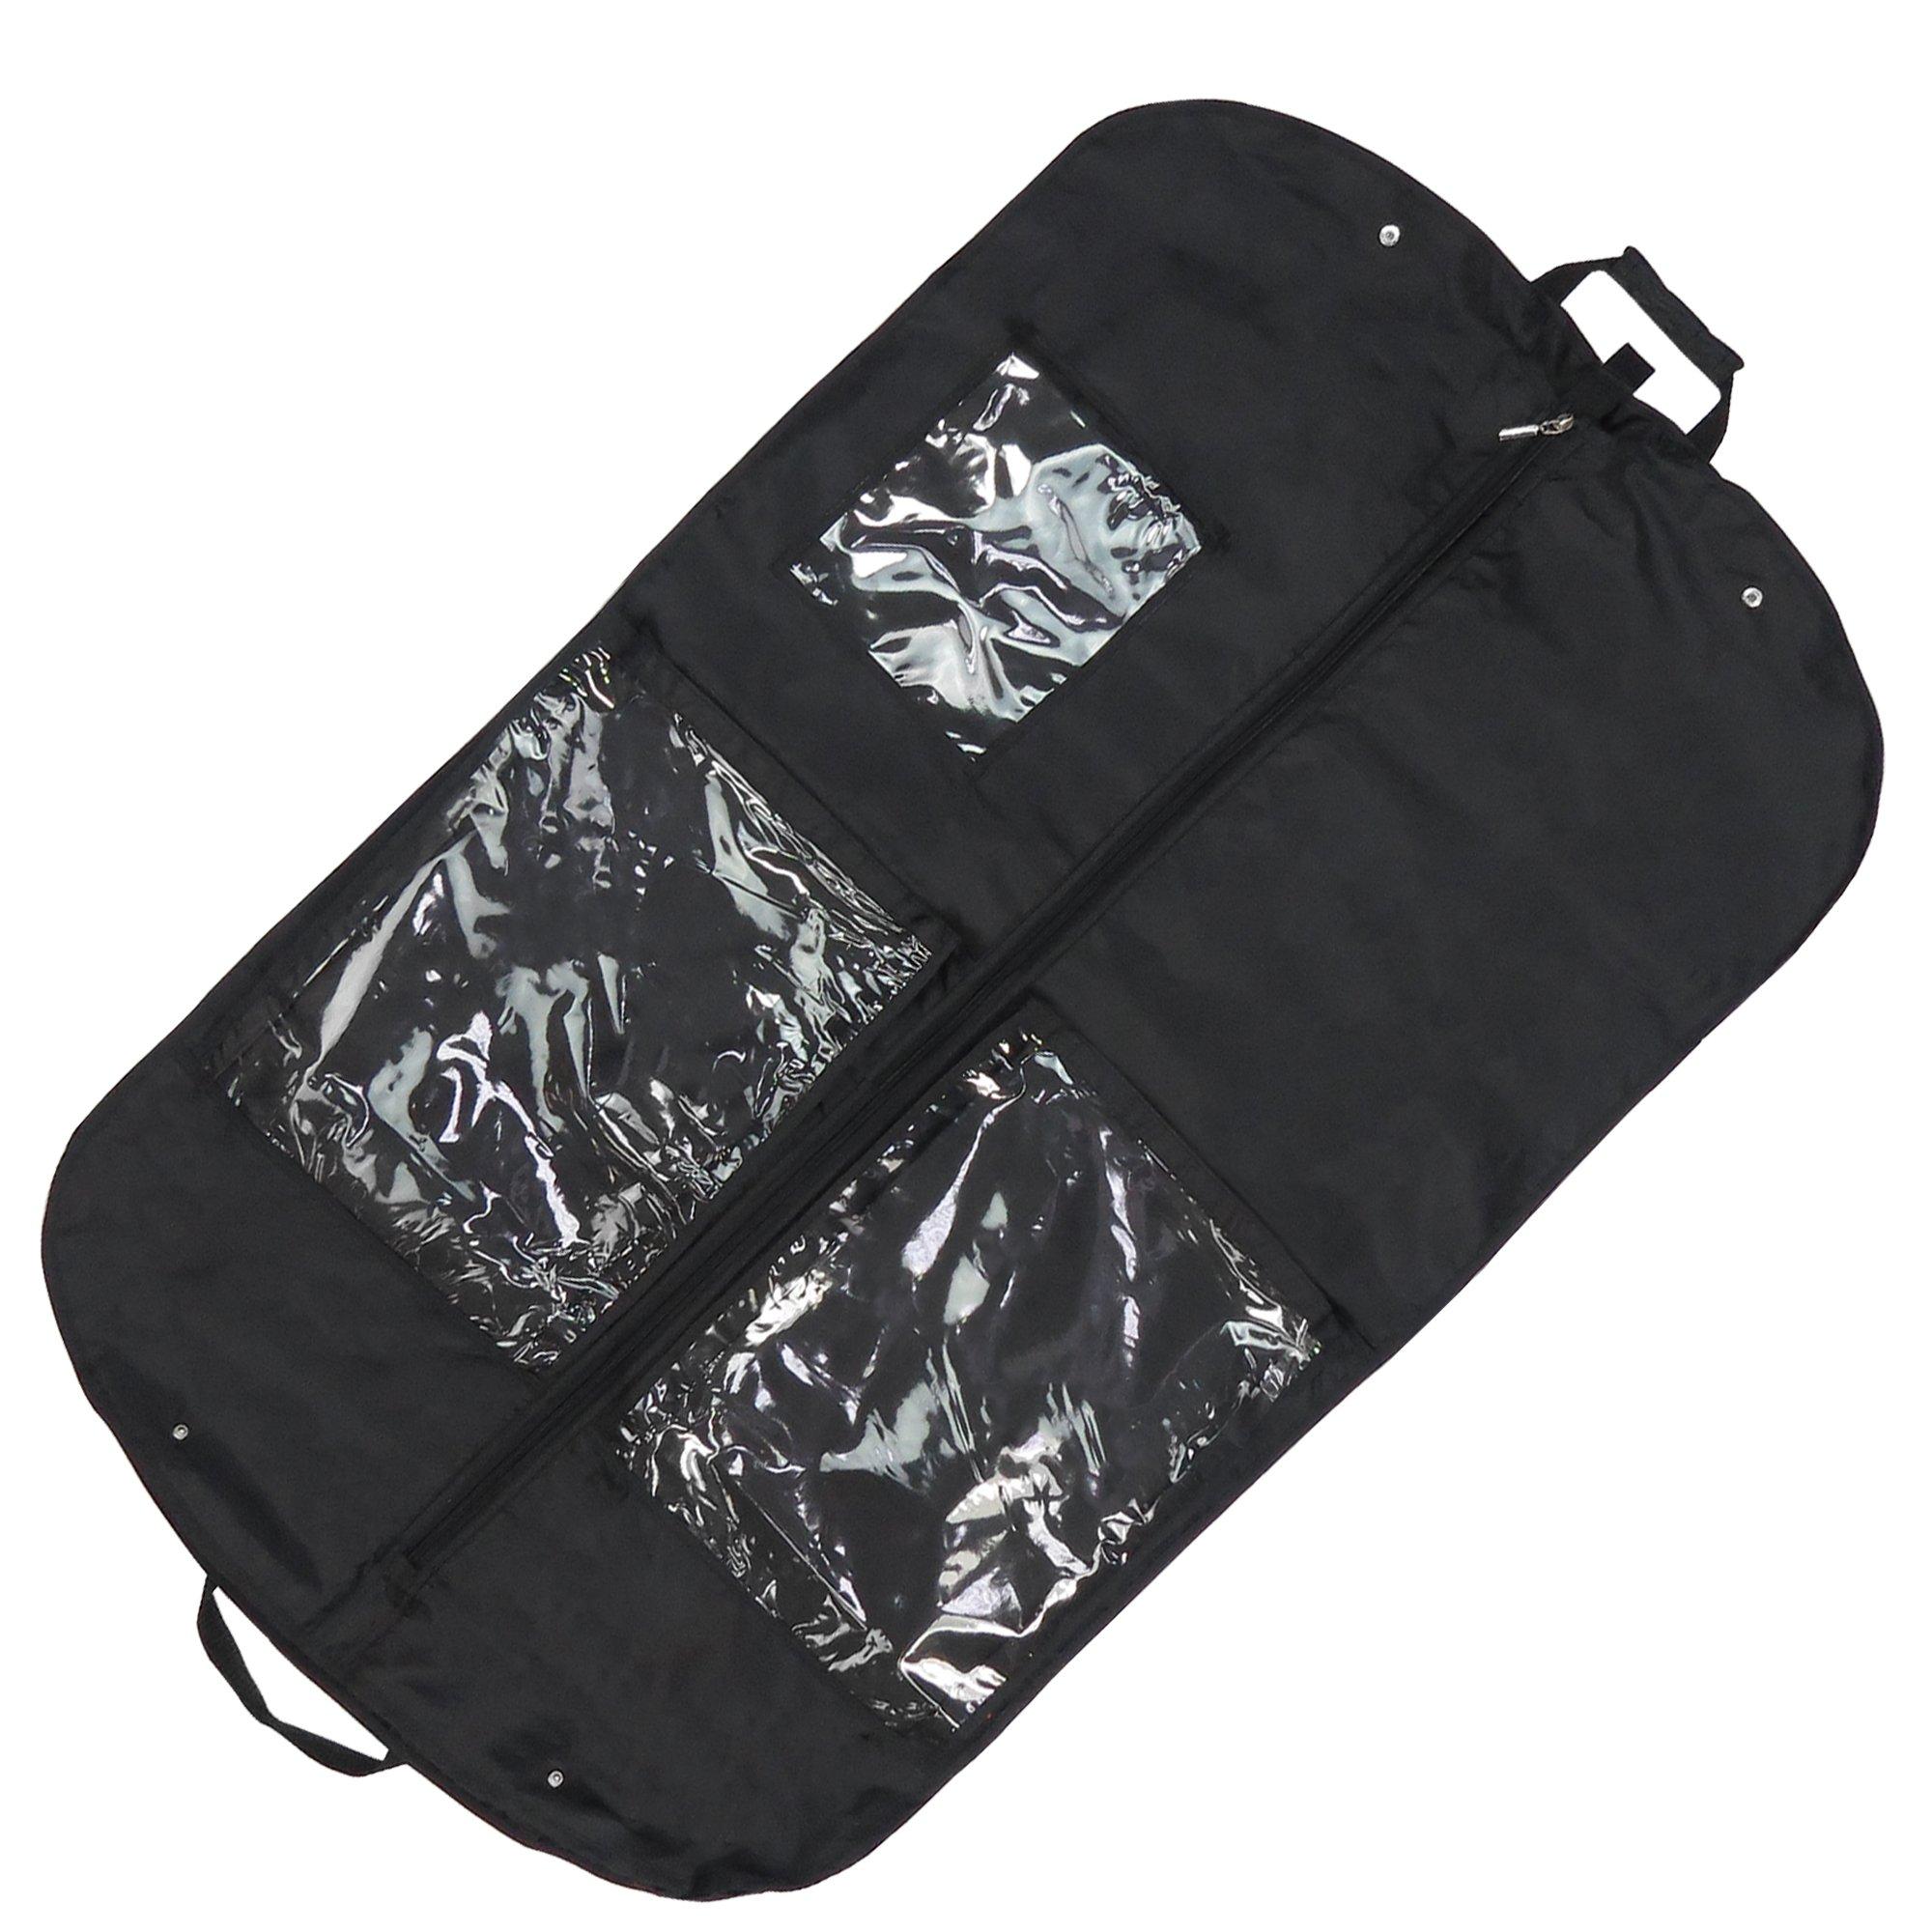 Hangerworld - Porta Trajes Con Asas Para Viajes, Negro, 112 cm product image